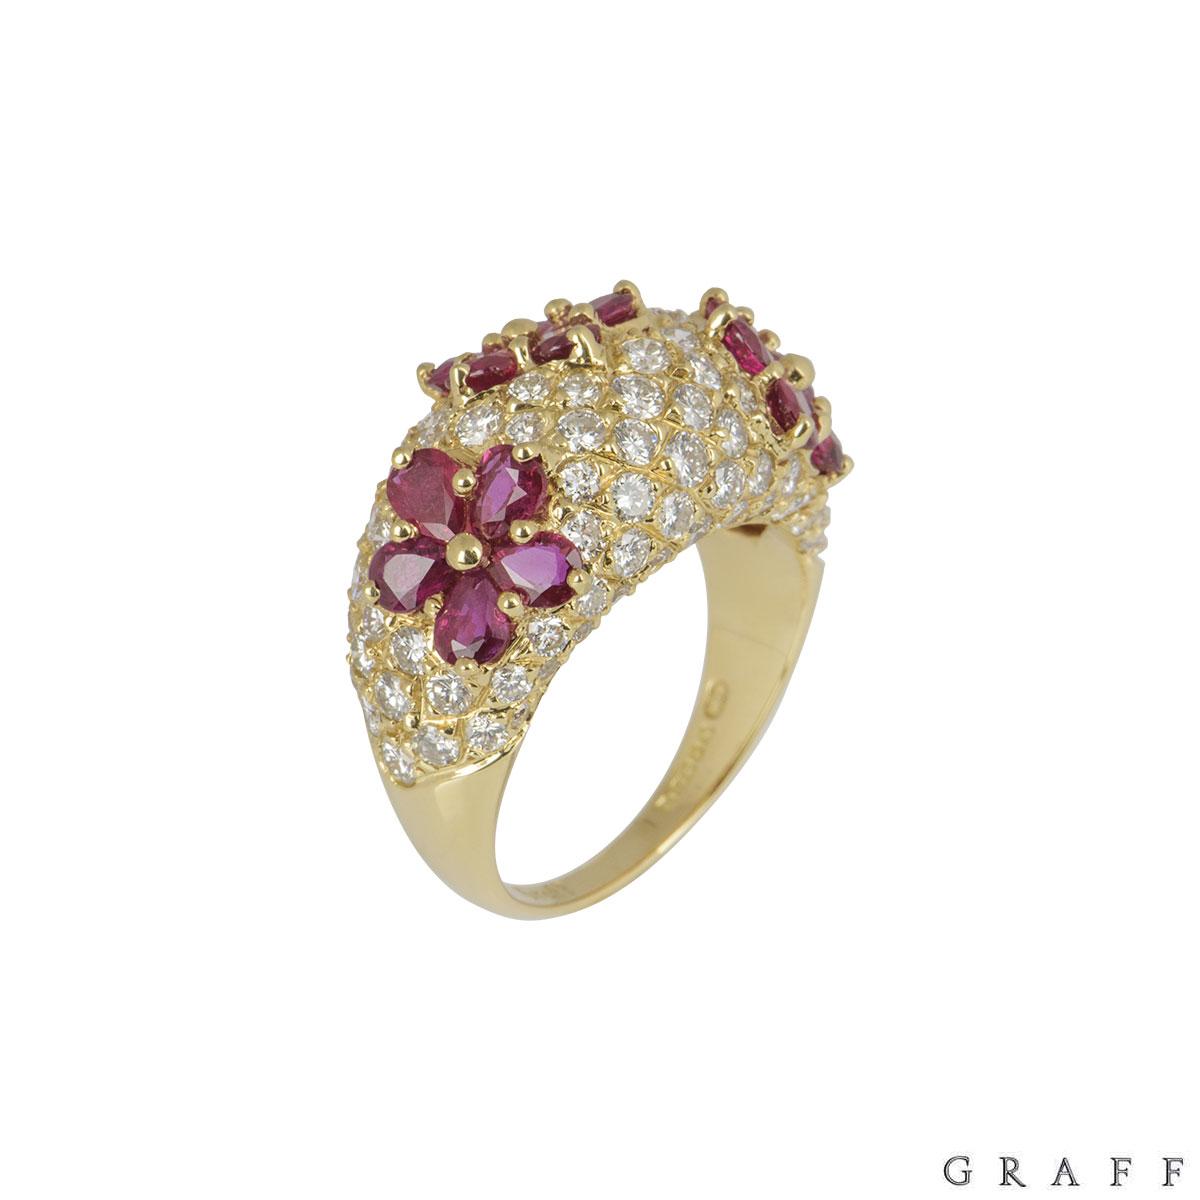 Graff Yellow Gold Diamond And Ruby Set Ring